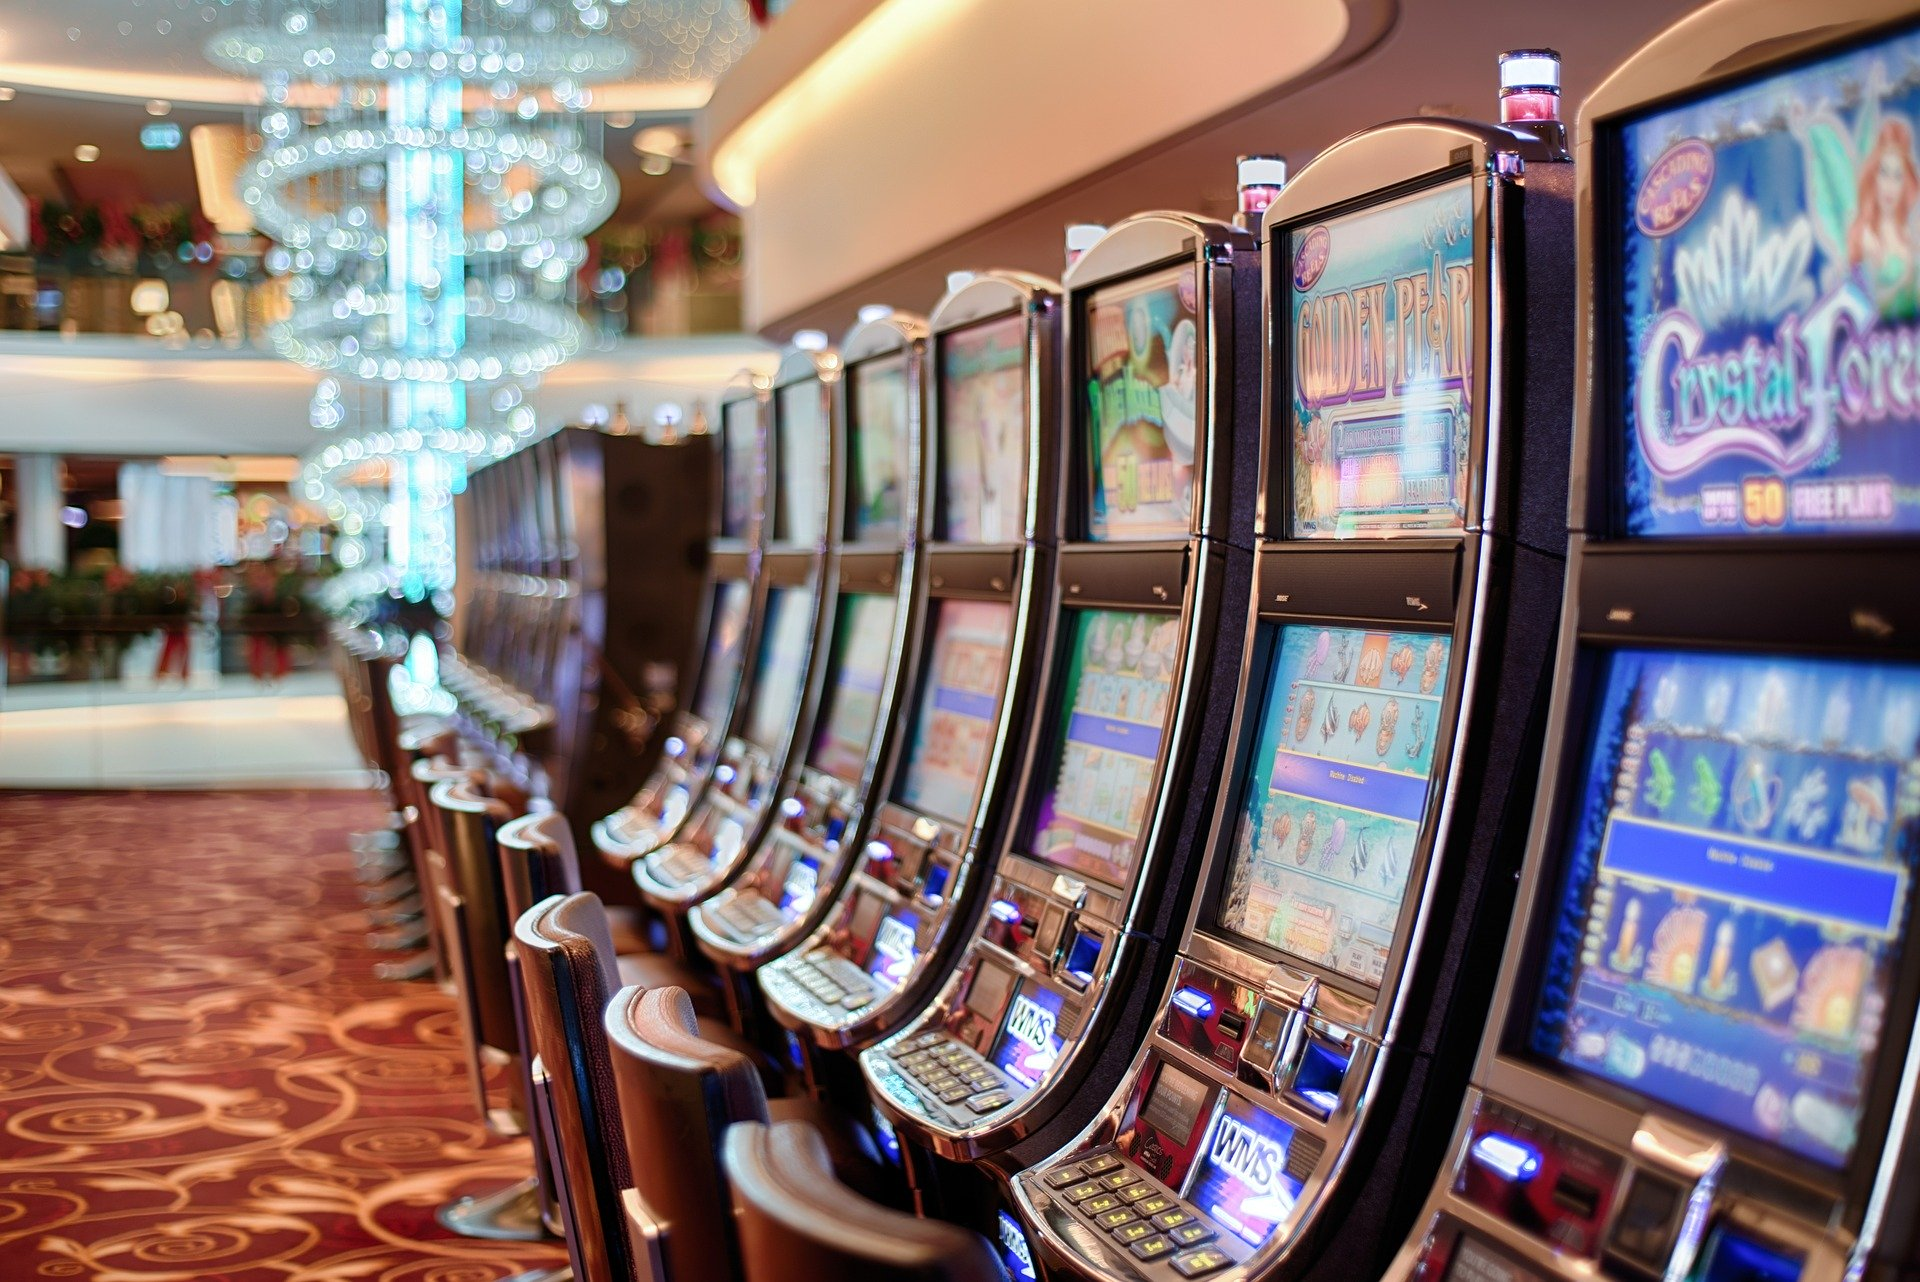 Gambling casino in venice italy